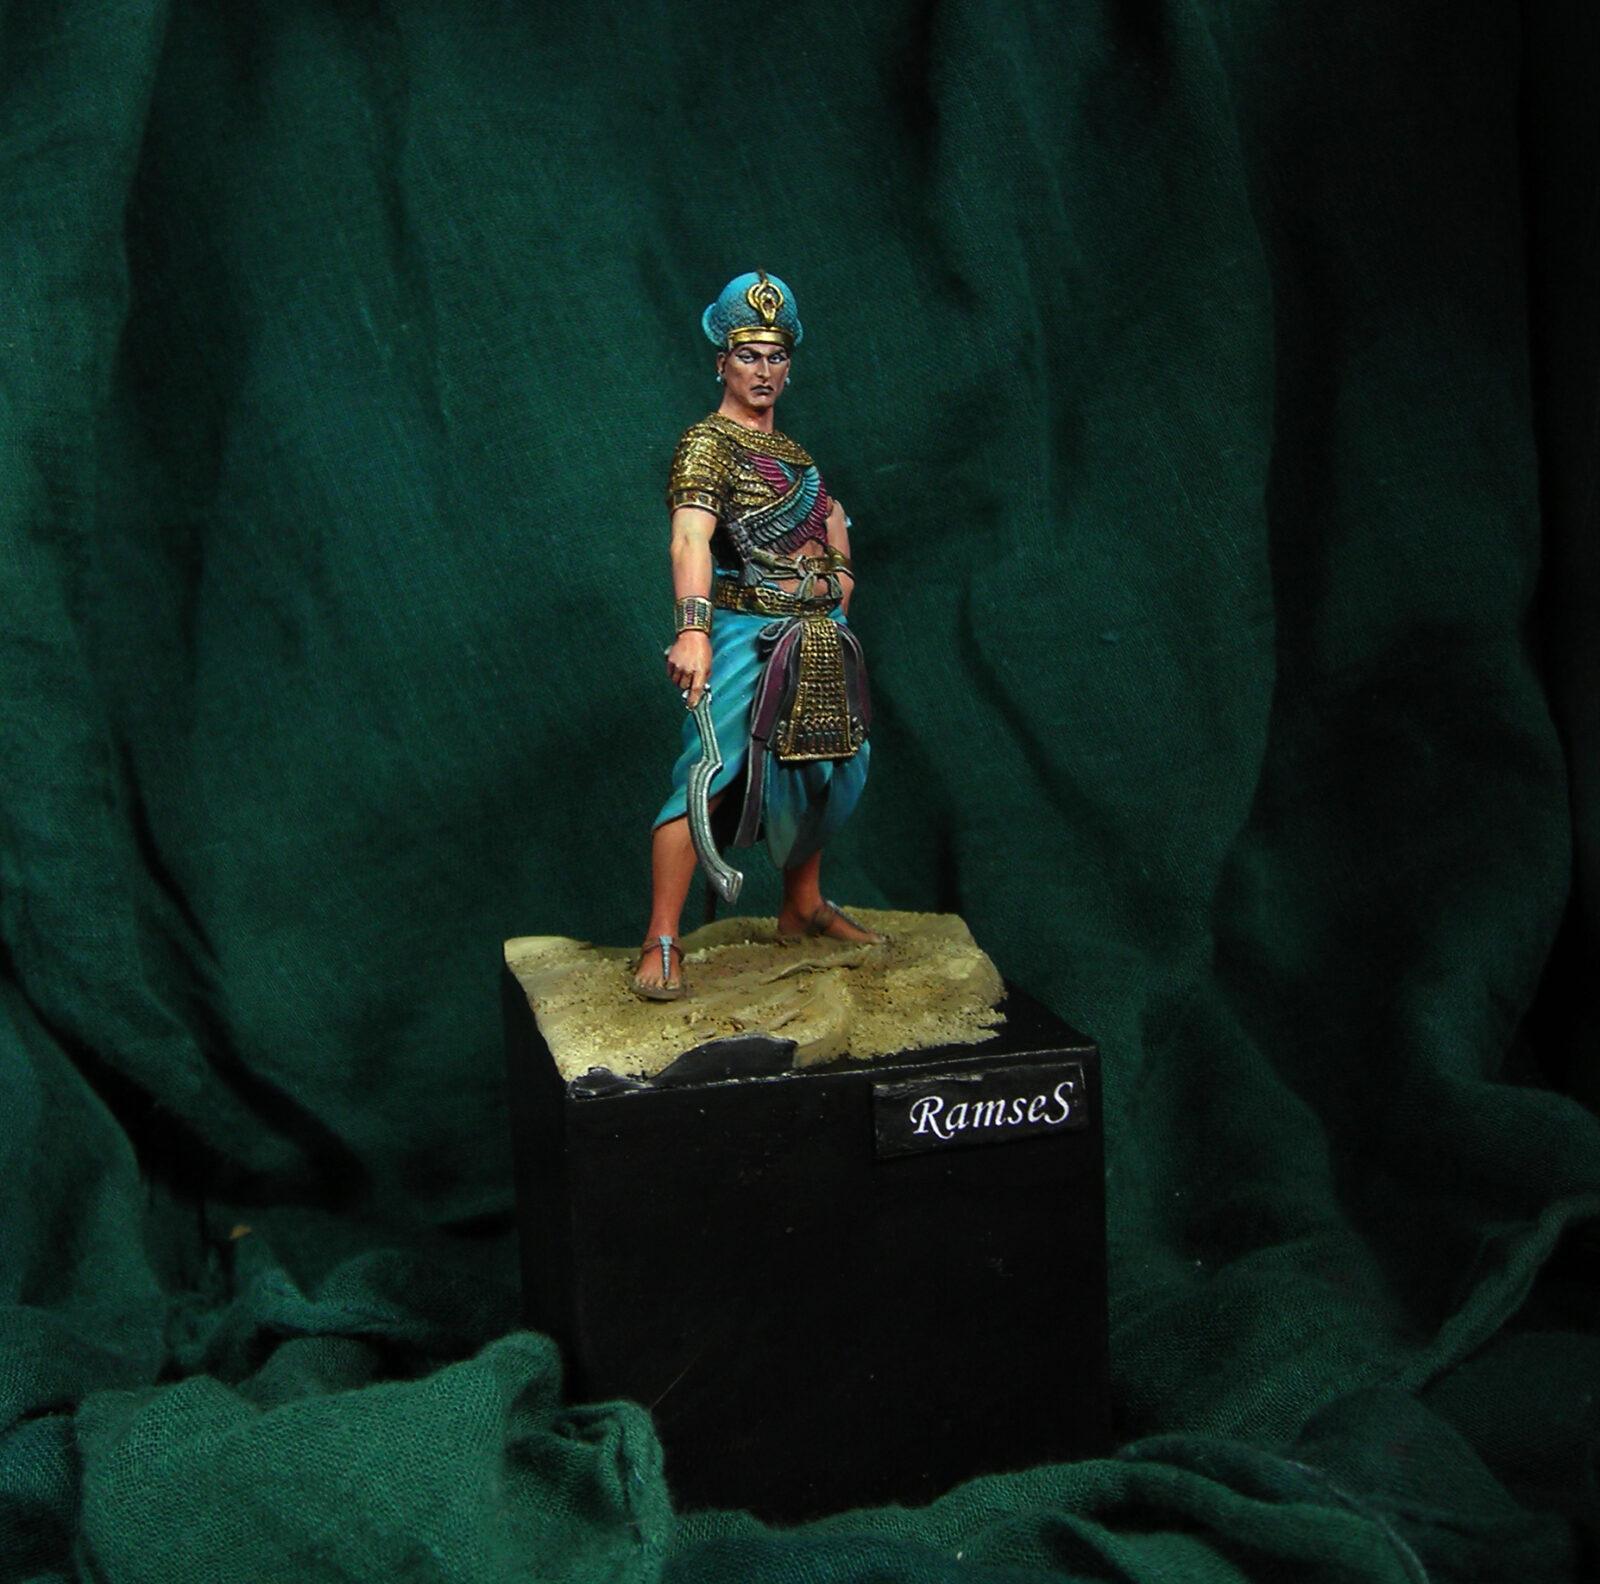 Ramses01